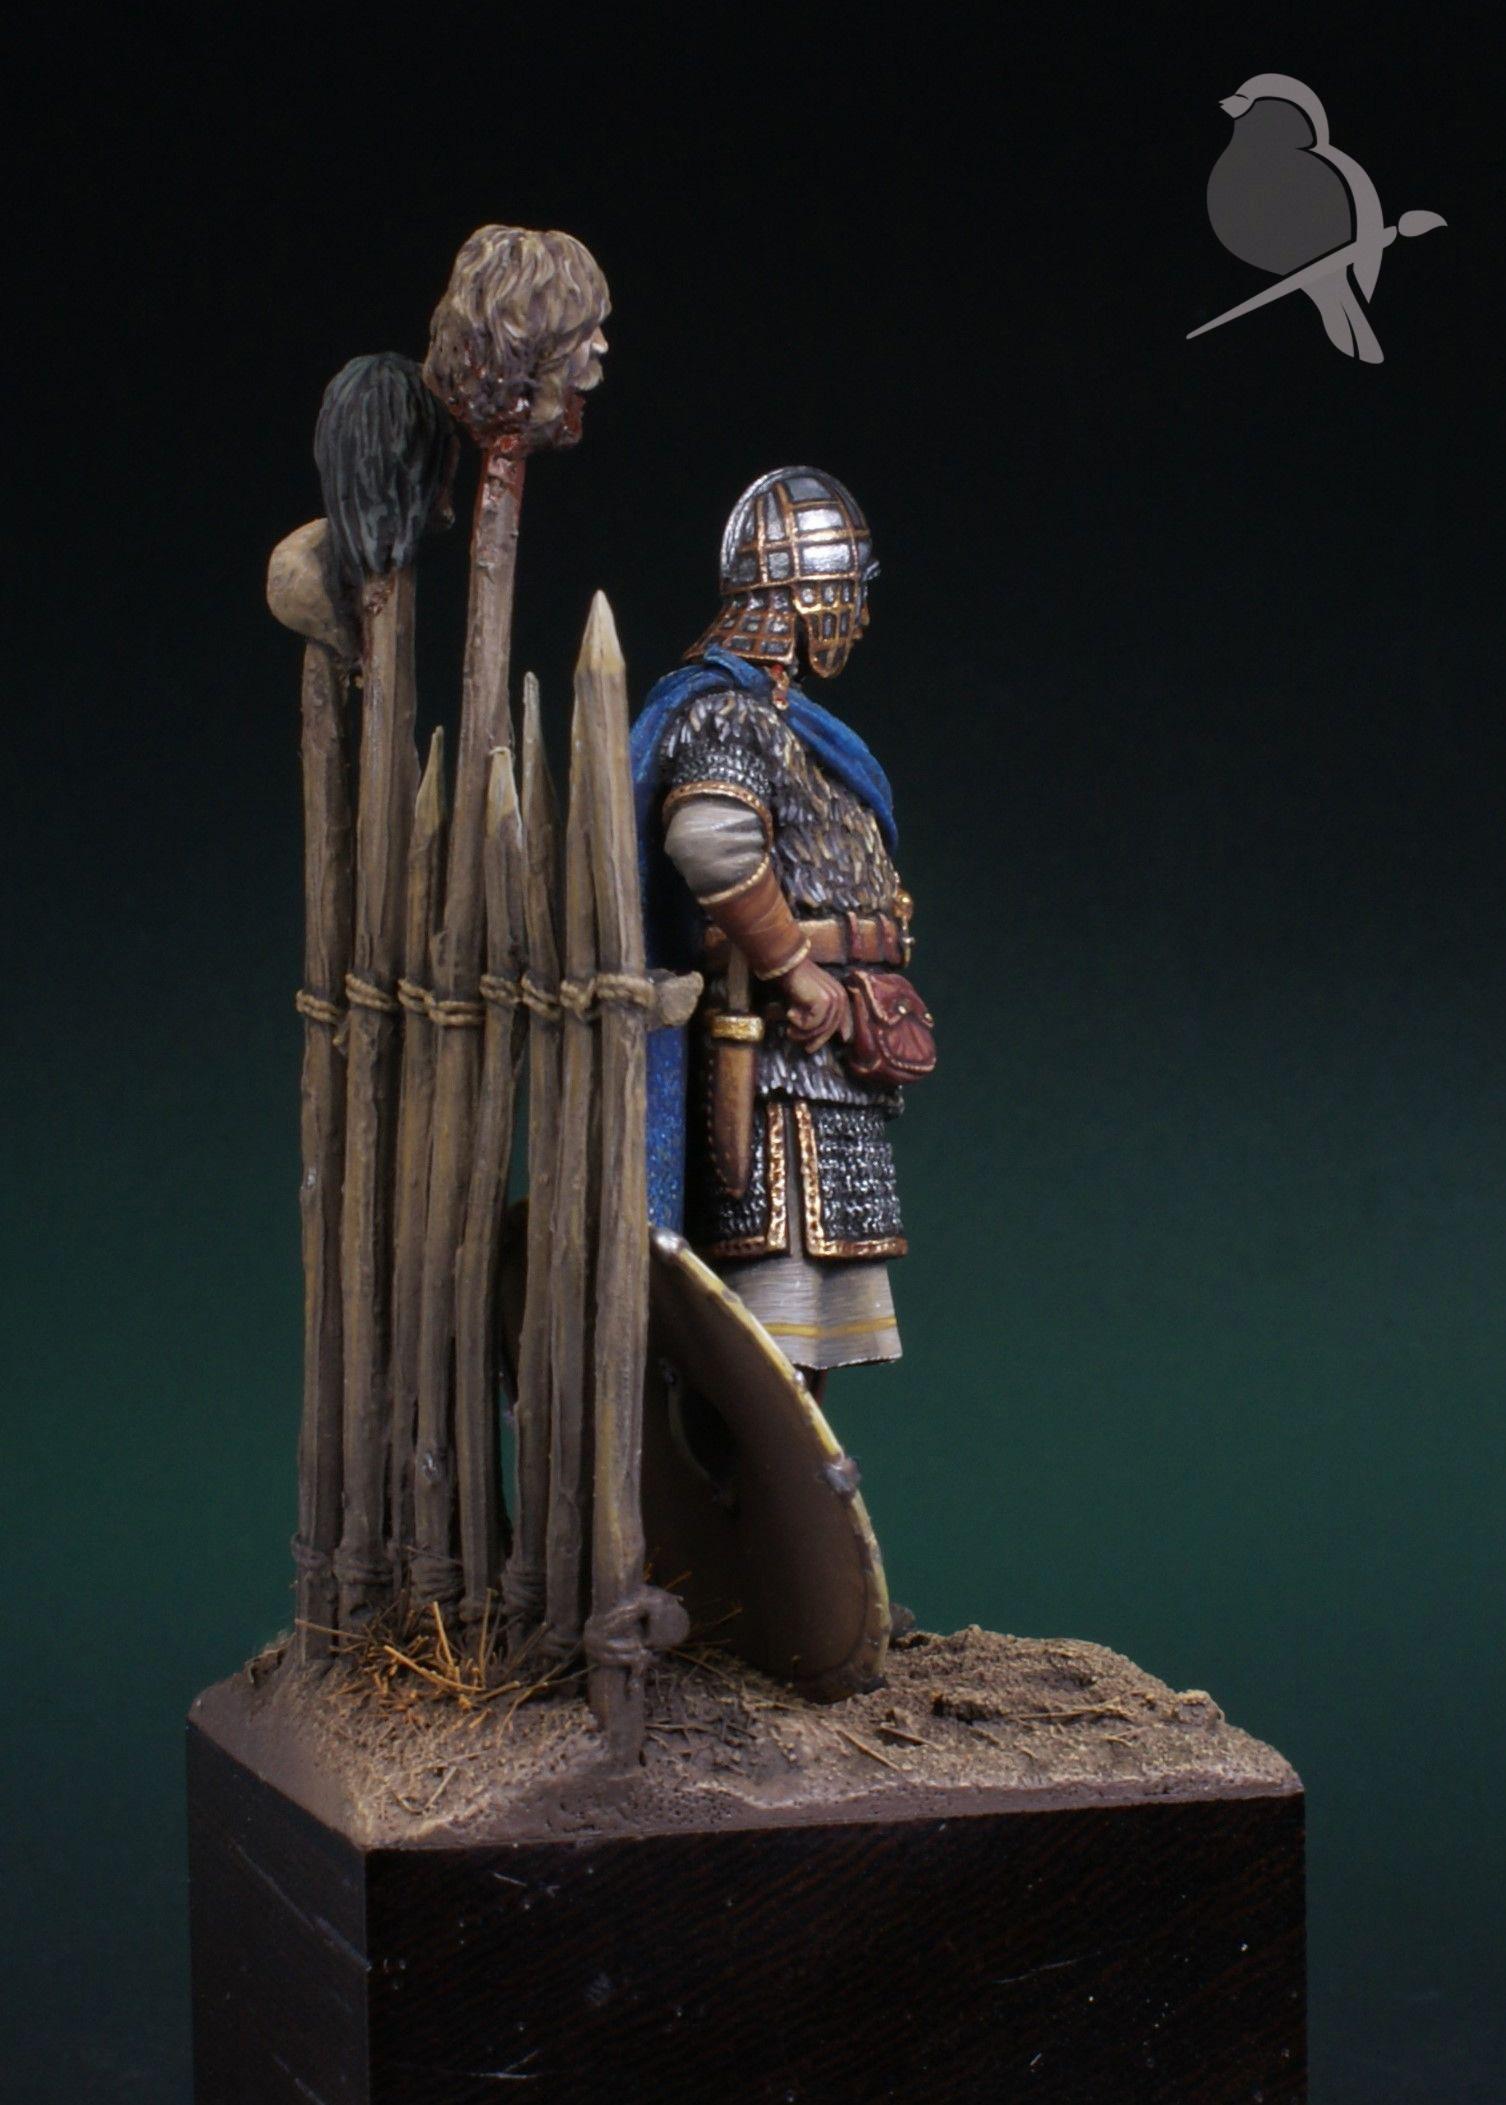 Figures: Saxon warlord, photo #5